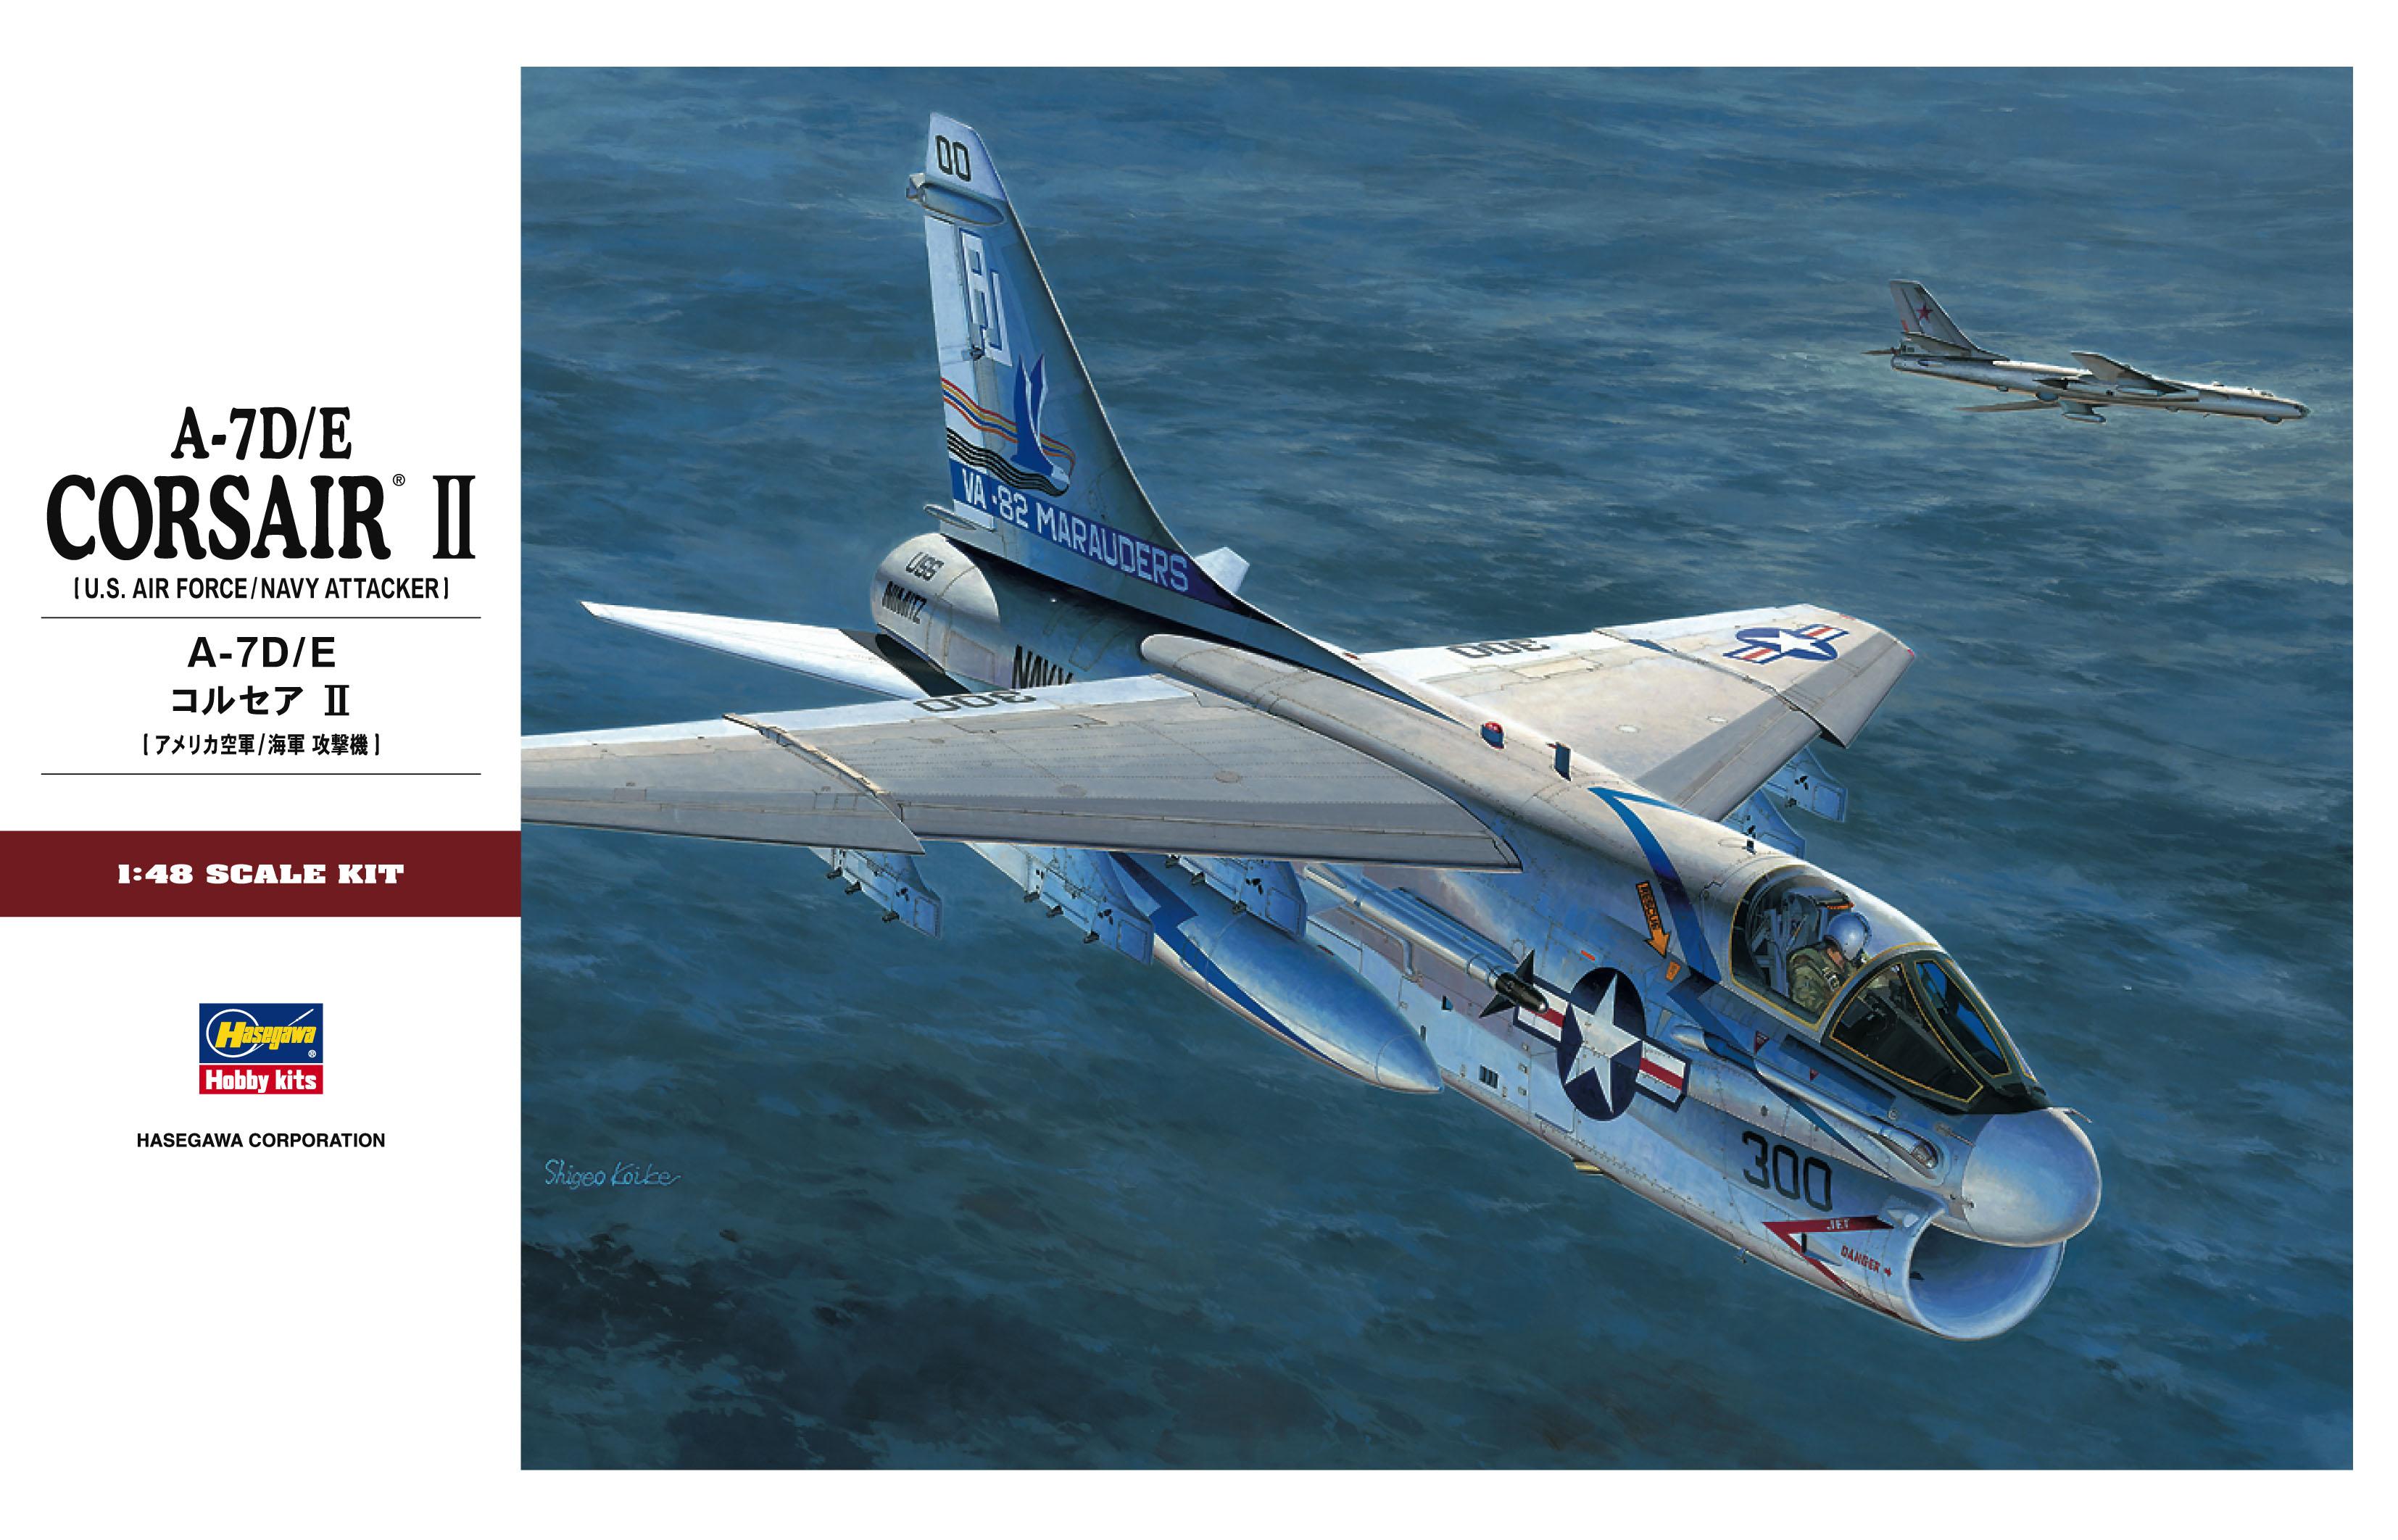 Hasegawa 1/48 A-7D/E Corsair II